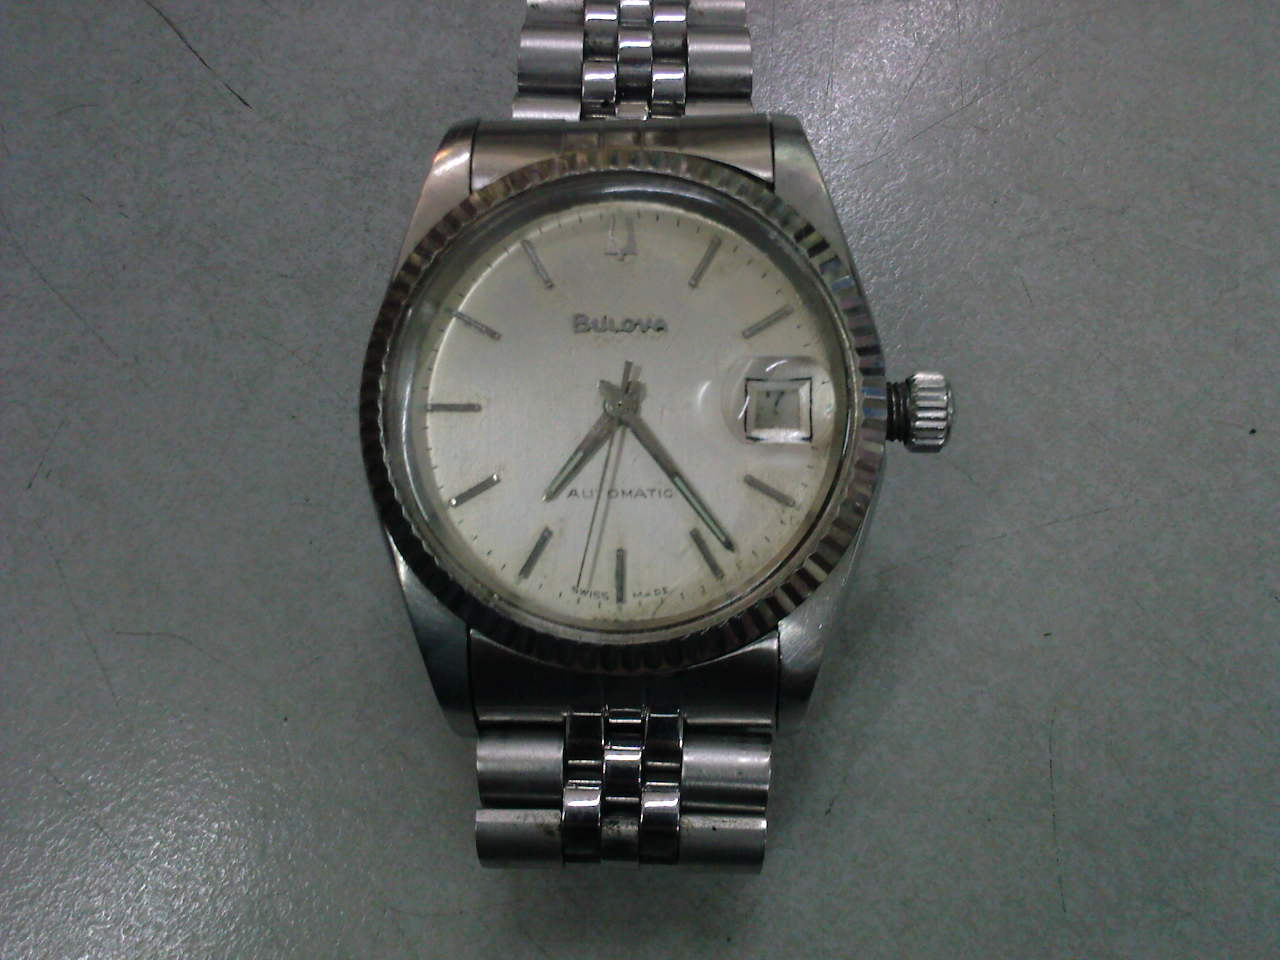 Vintage Bulova Watch for Sale